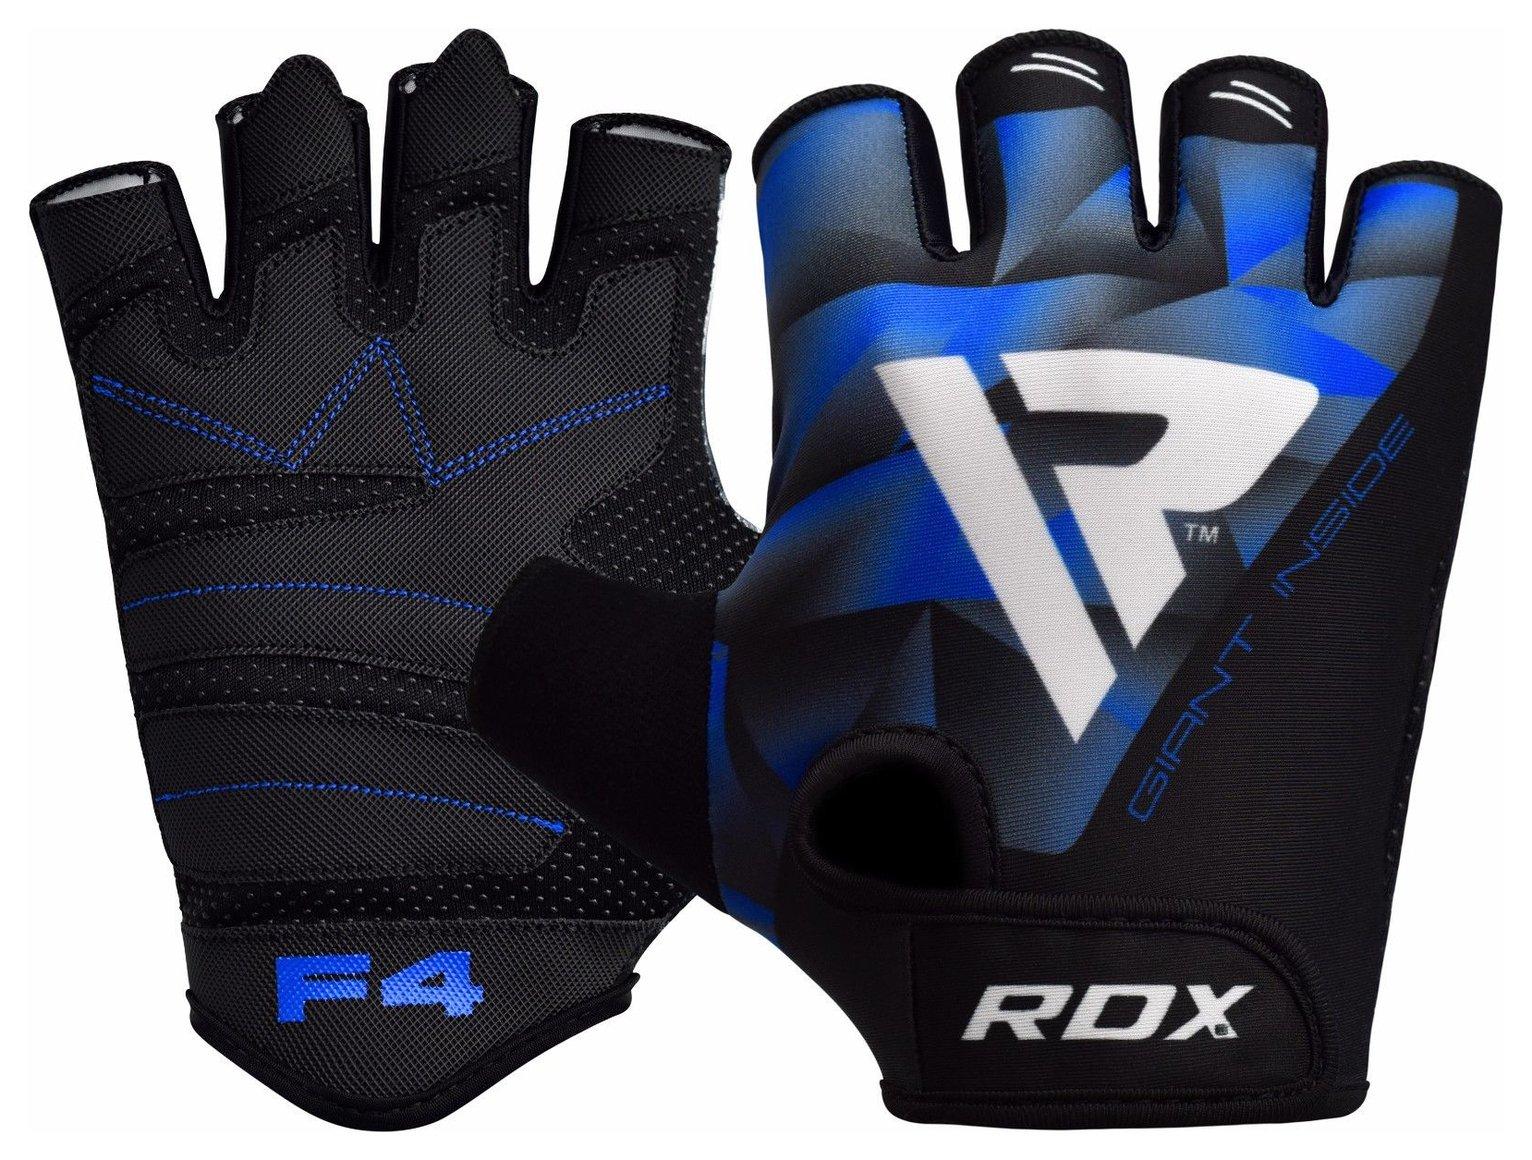 RDX Large/Extra Large Weight Lifting Gloves - Blue